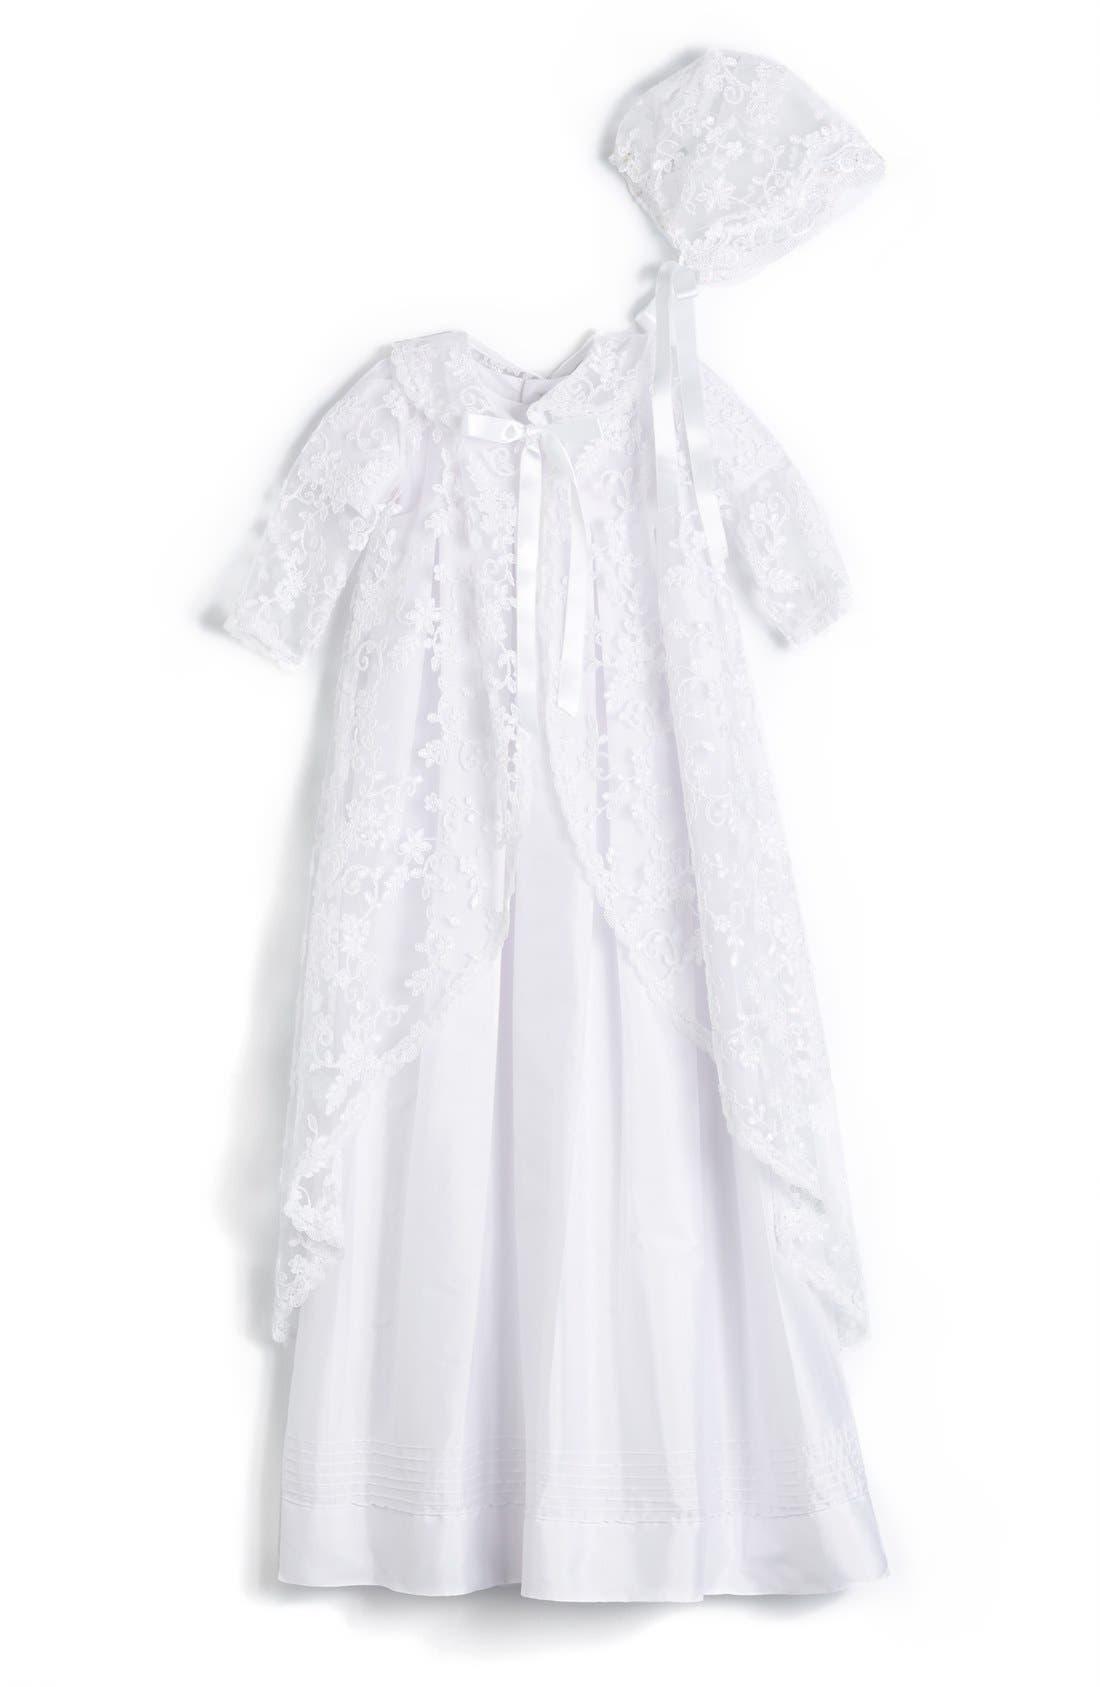 ISABEL GARRETON 'Renaissance' Christening Gown & Bonnet